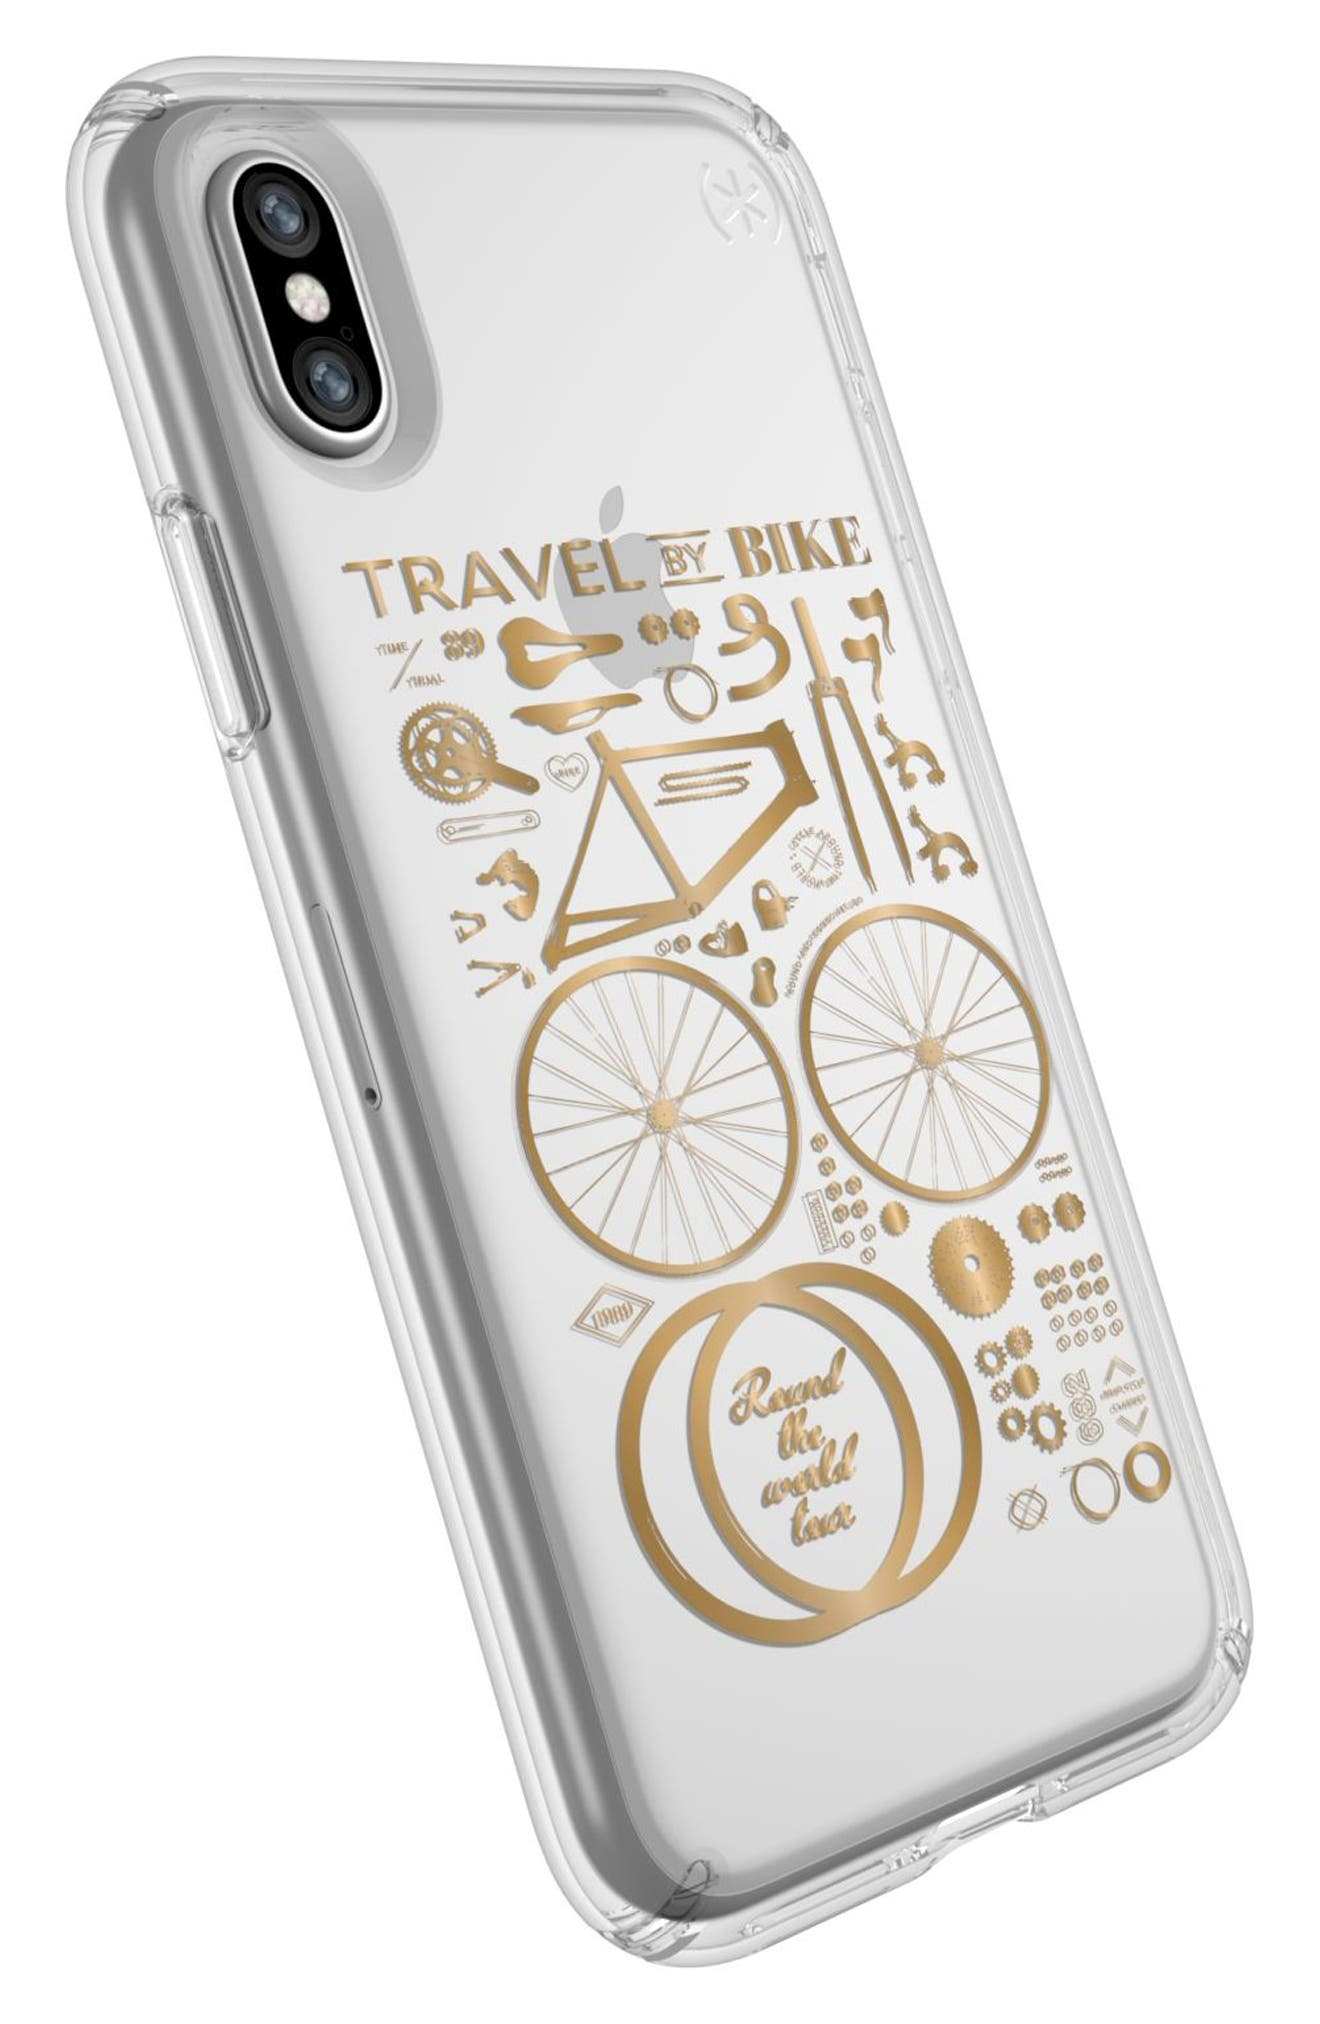 Metallic City Bike Transparent iPhone X Case,                             Alternate thumbnail 8, color,                             712